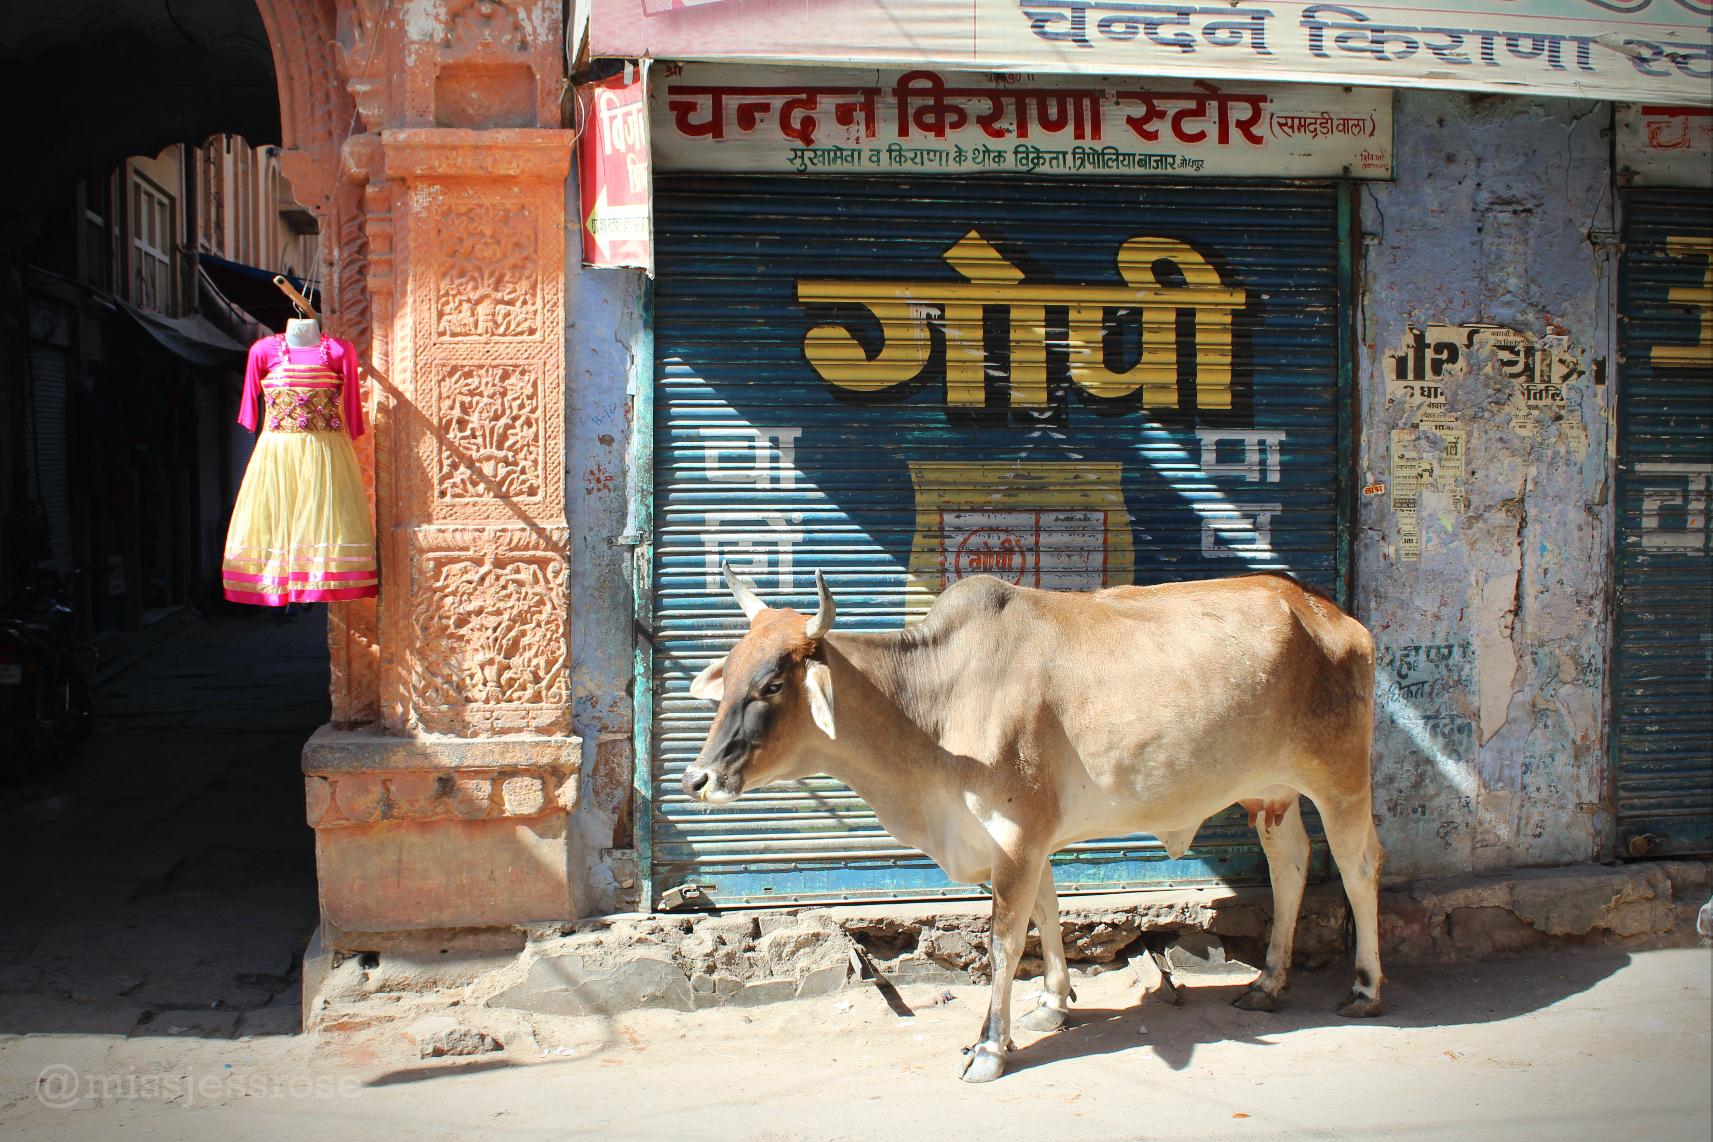 Street cow chillaxing in Jodhpur, India.